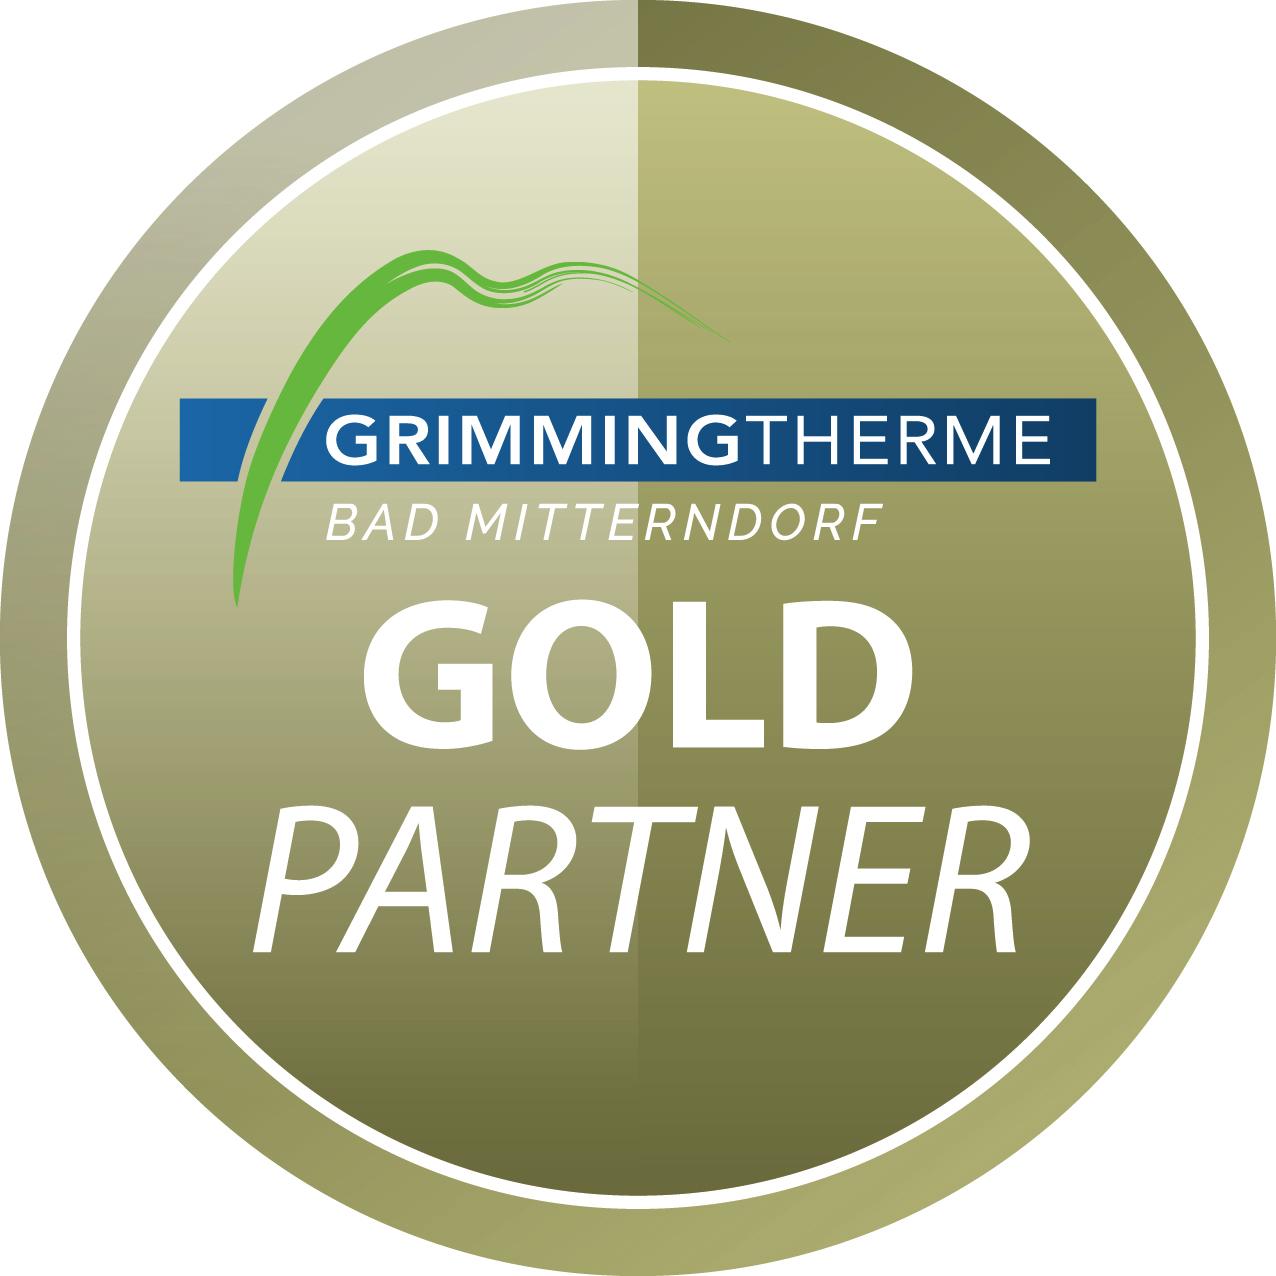 GrimmingTherme Partner Programm Gold Partner Button